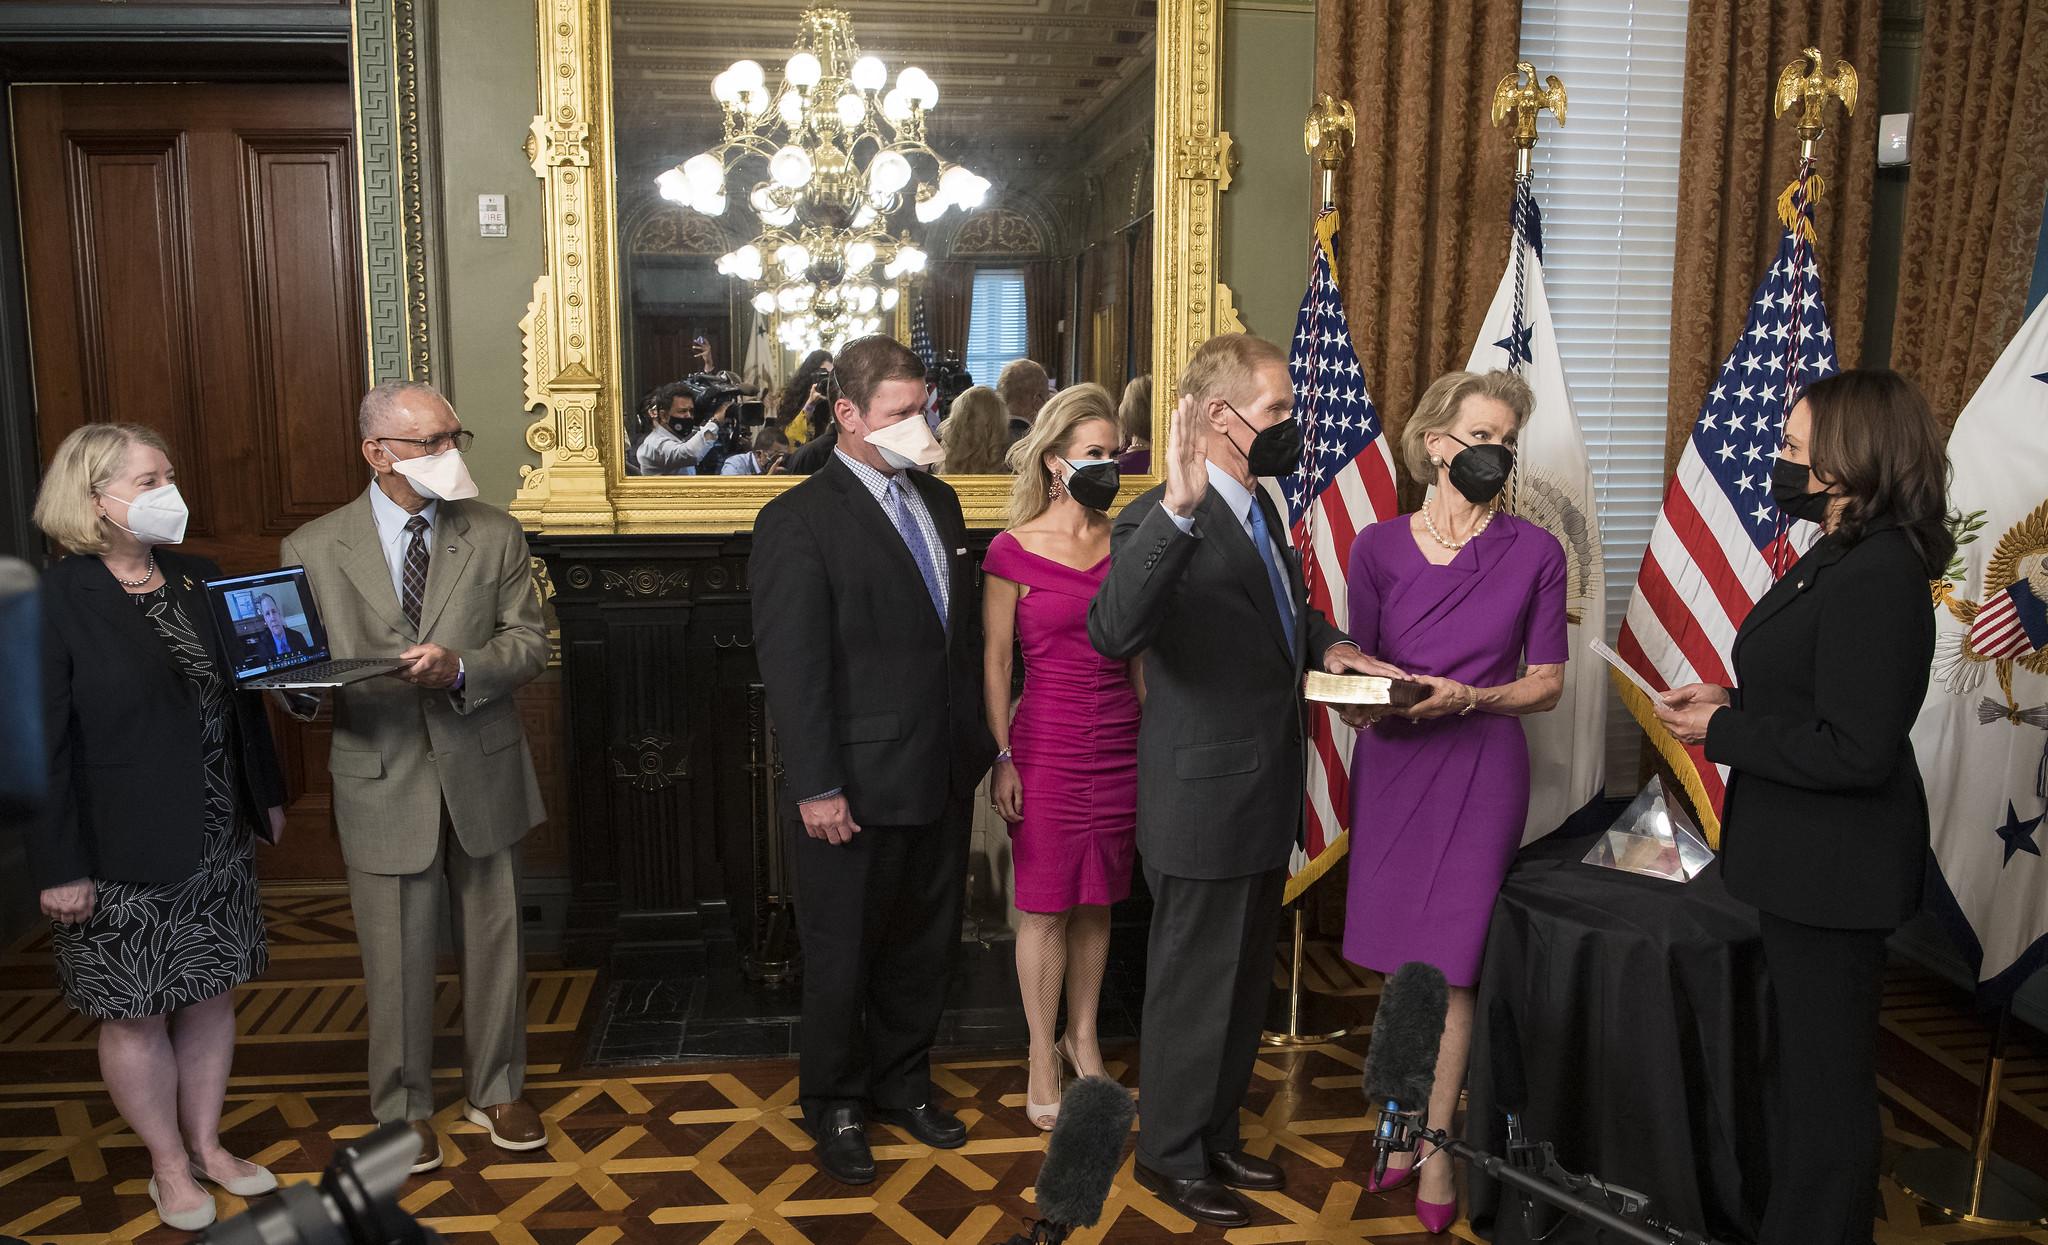 Former U.S. Senator Bill Nelson Sworn in as Next NASA Administrator after Unanimous Senate Confirmation